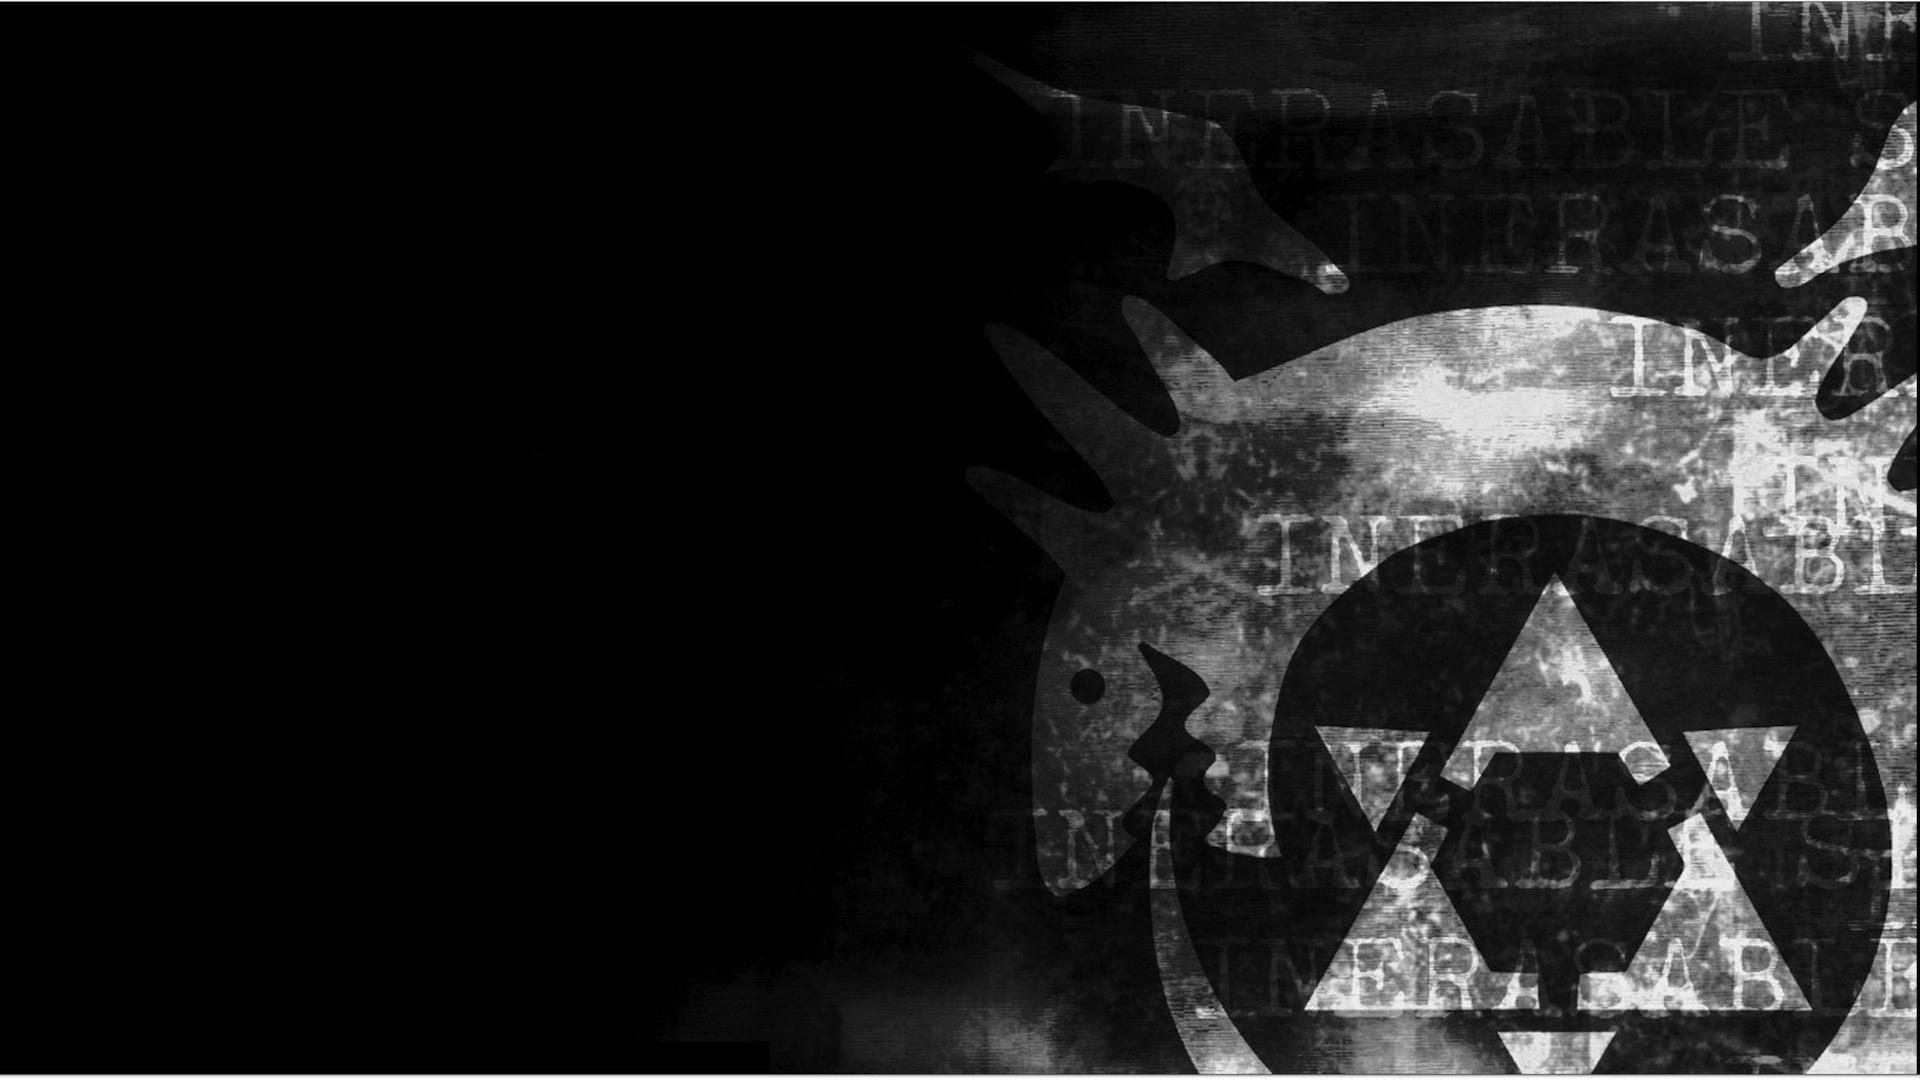 Fma Wallpaper Quotes Fullmetal Alchemist Over Thinking It